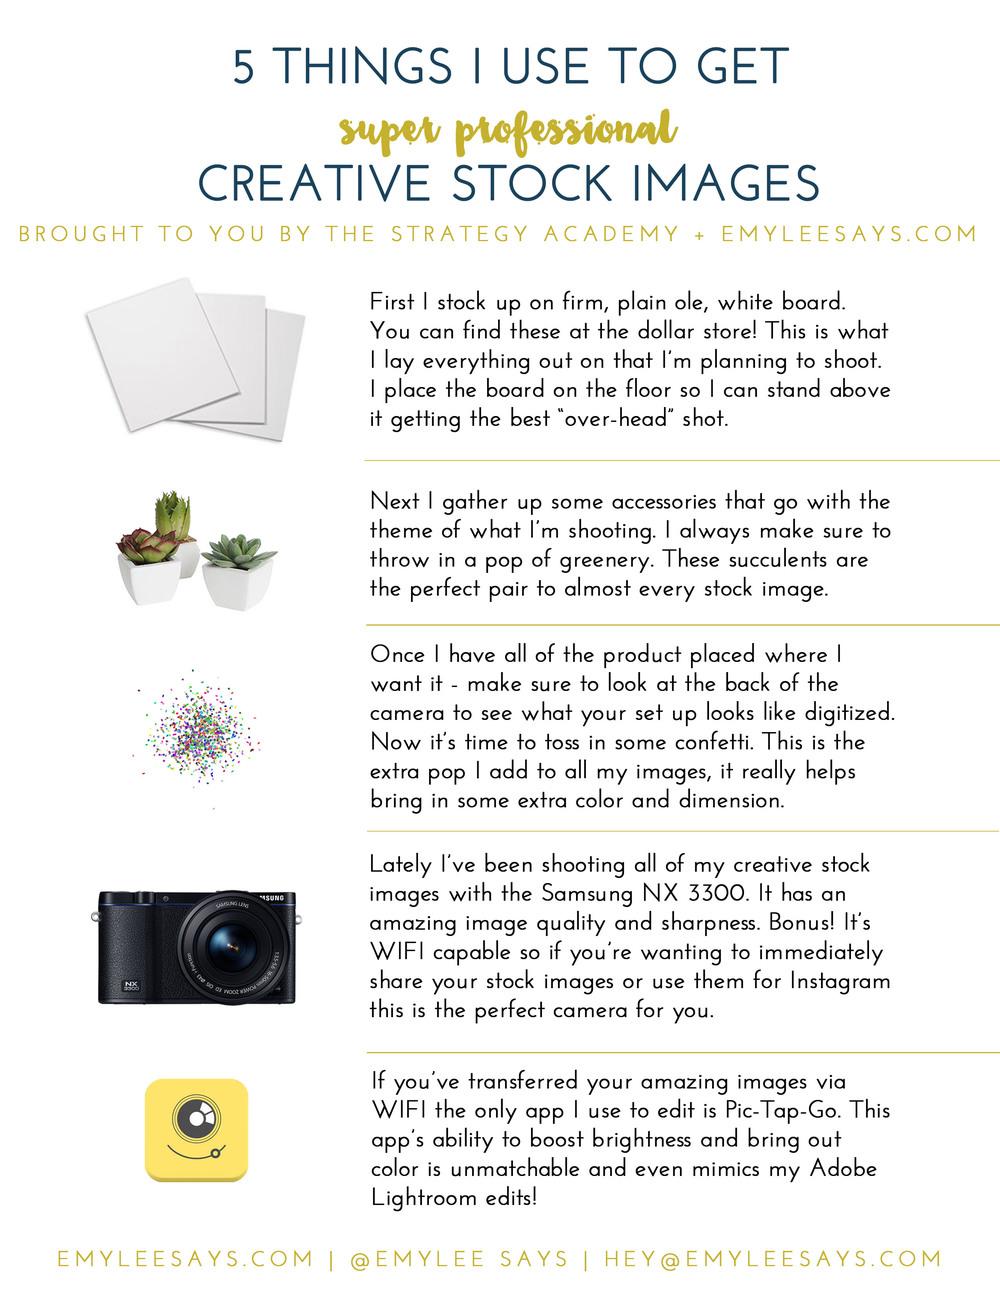 creativestockimages